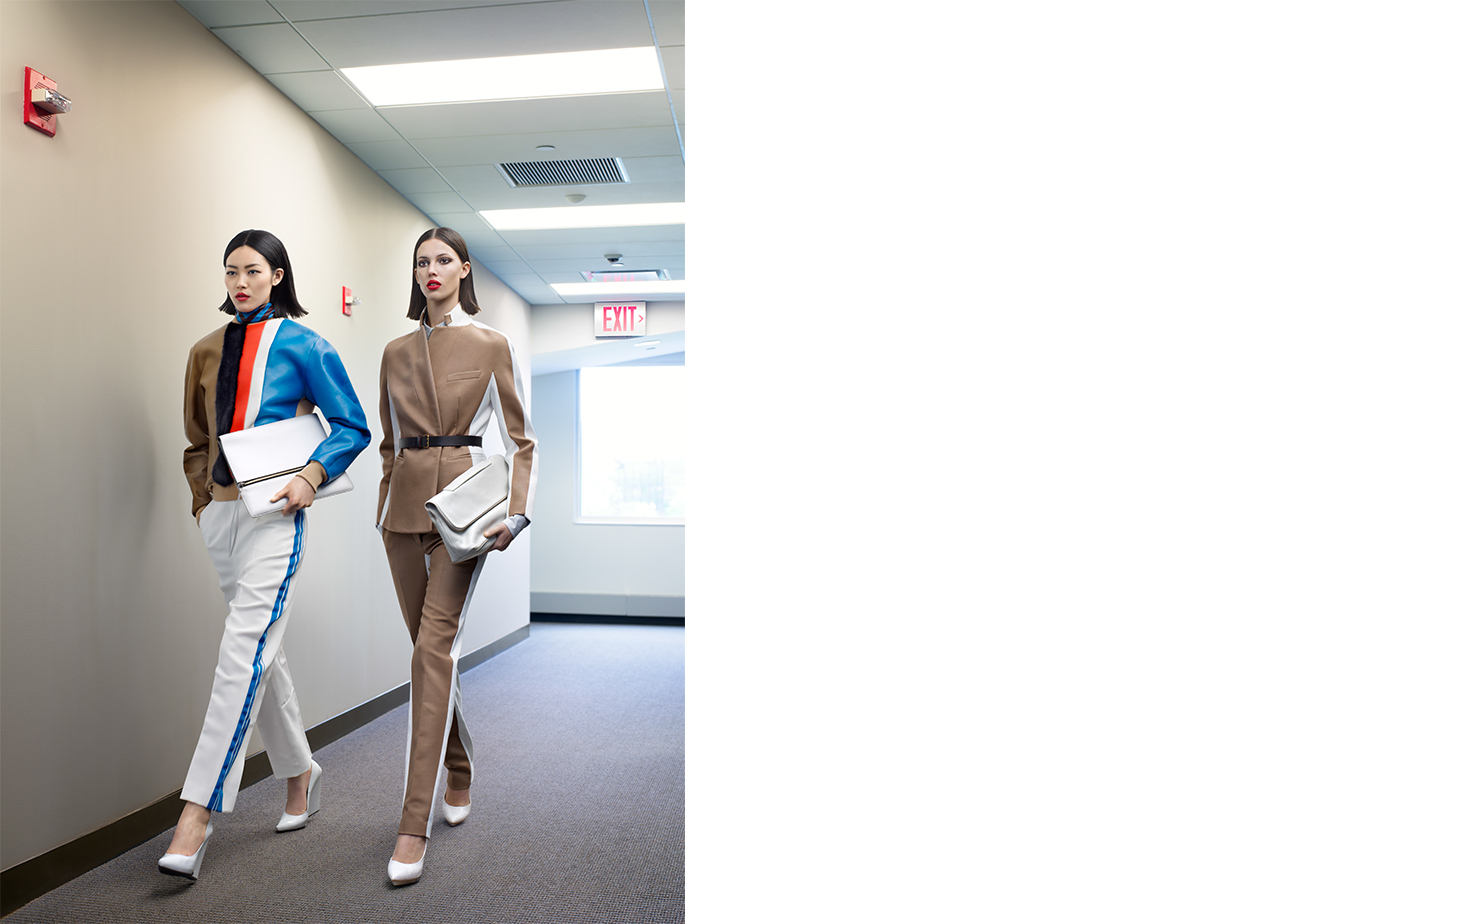 Vogue TWO OF A KIND   FASHION EDITOR Elissa Santisi MODELS Liu Wen, Ruby Aldridge